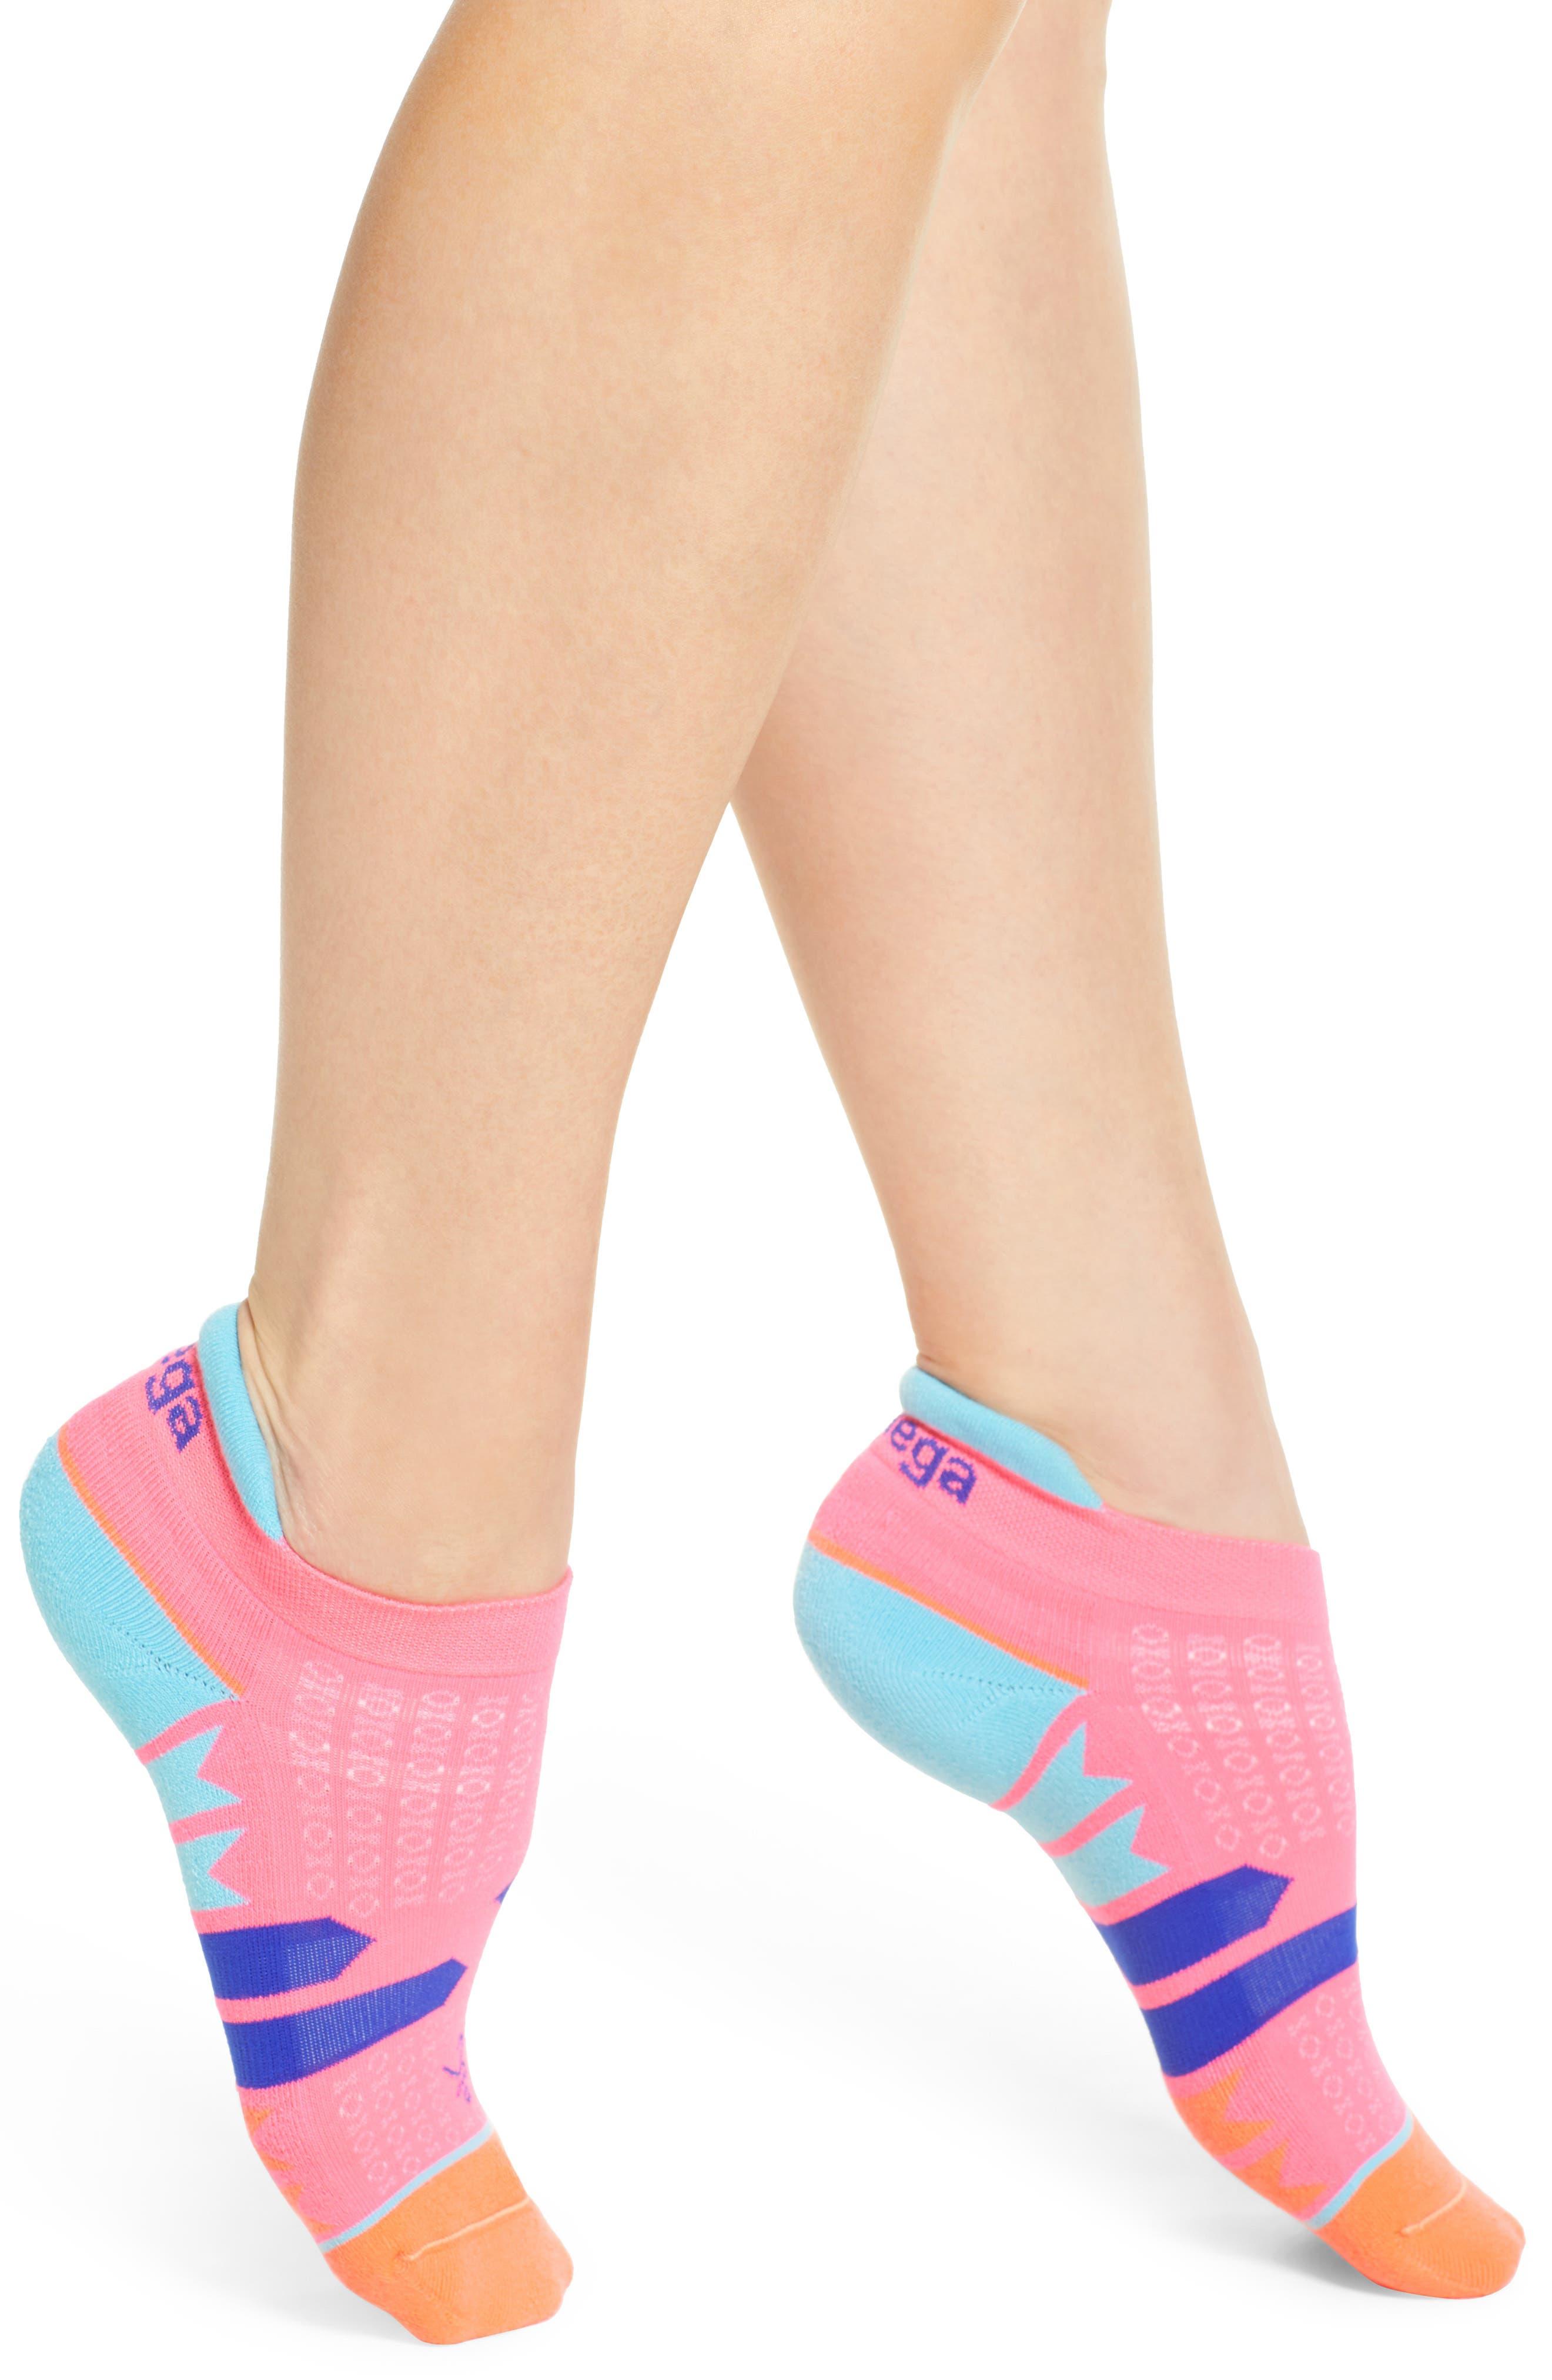 comforter balega wicking best moisture p the socks comfort knee hidden high